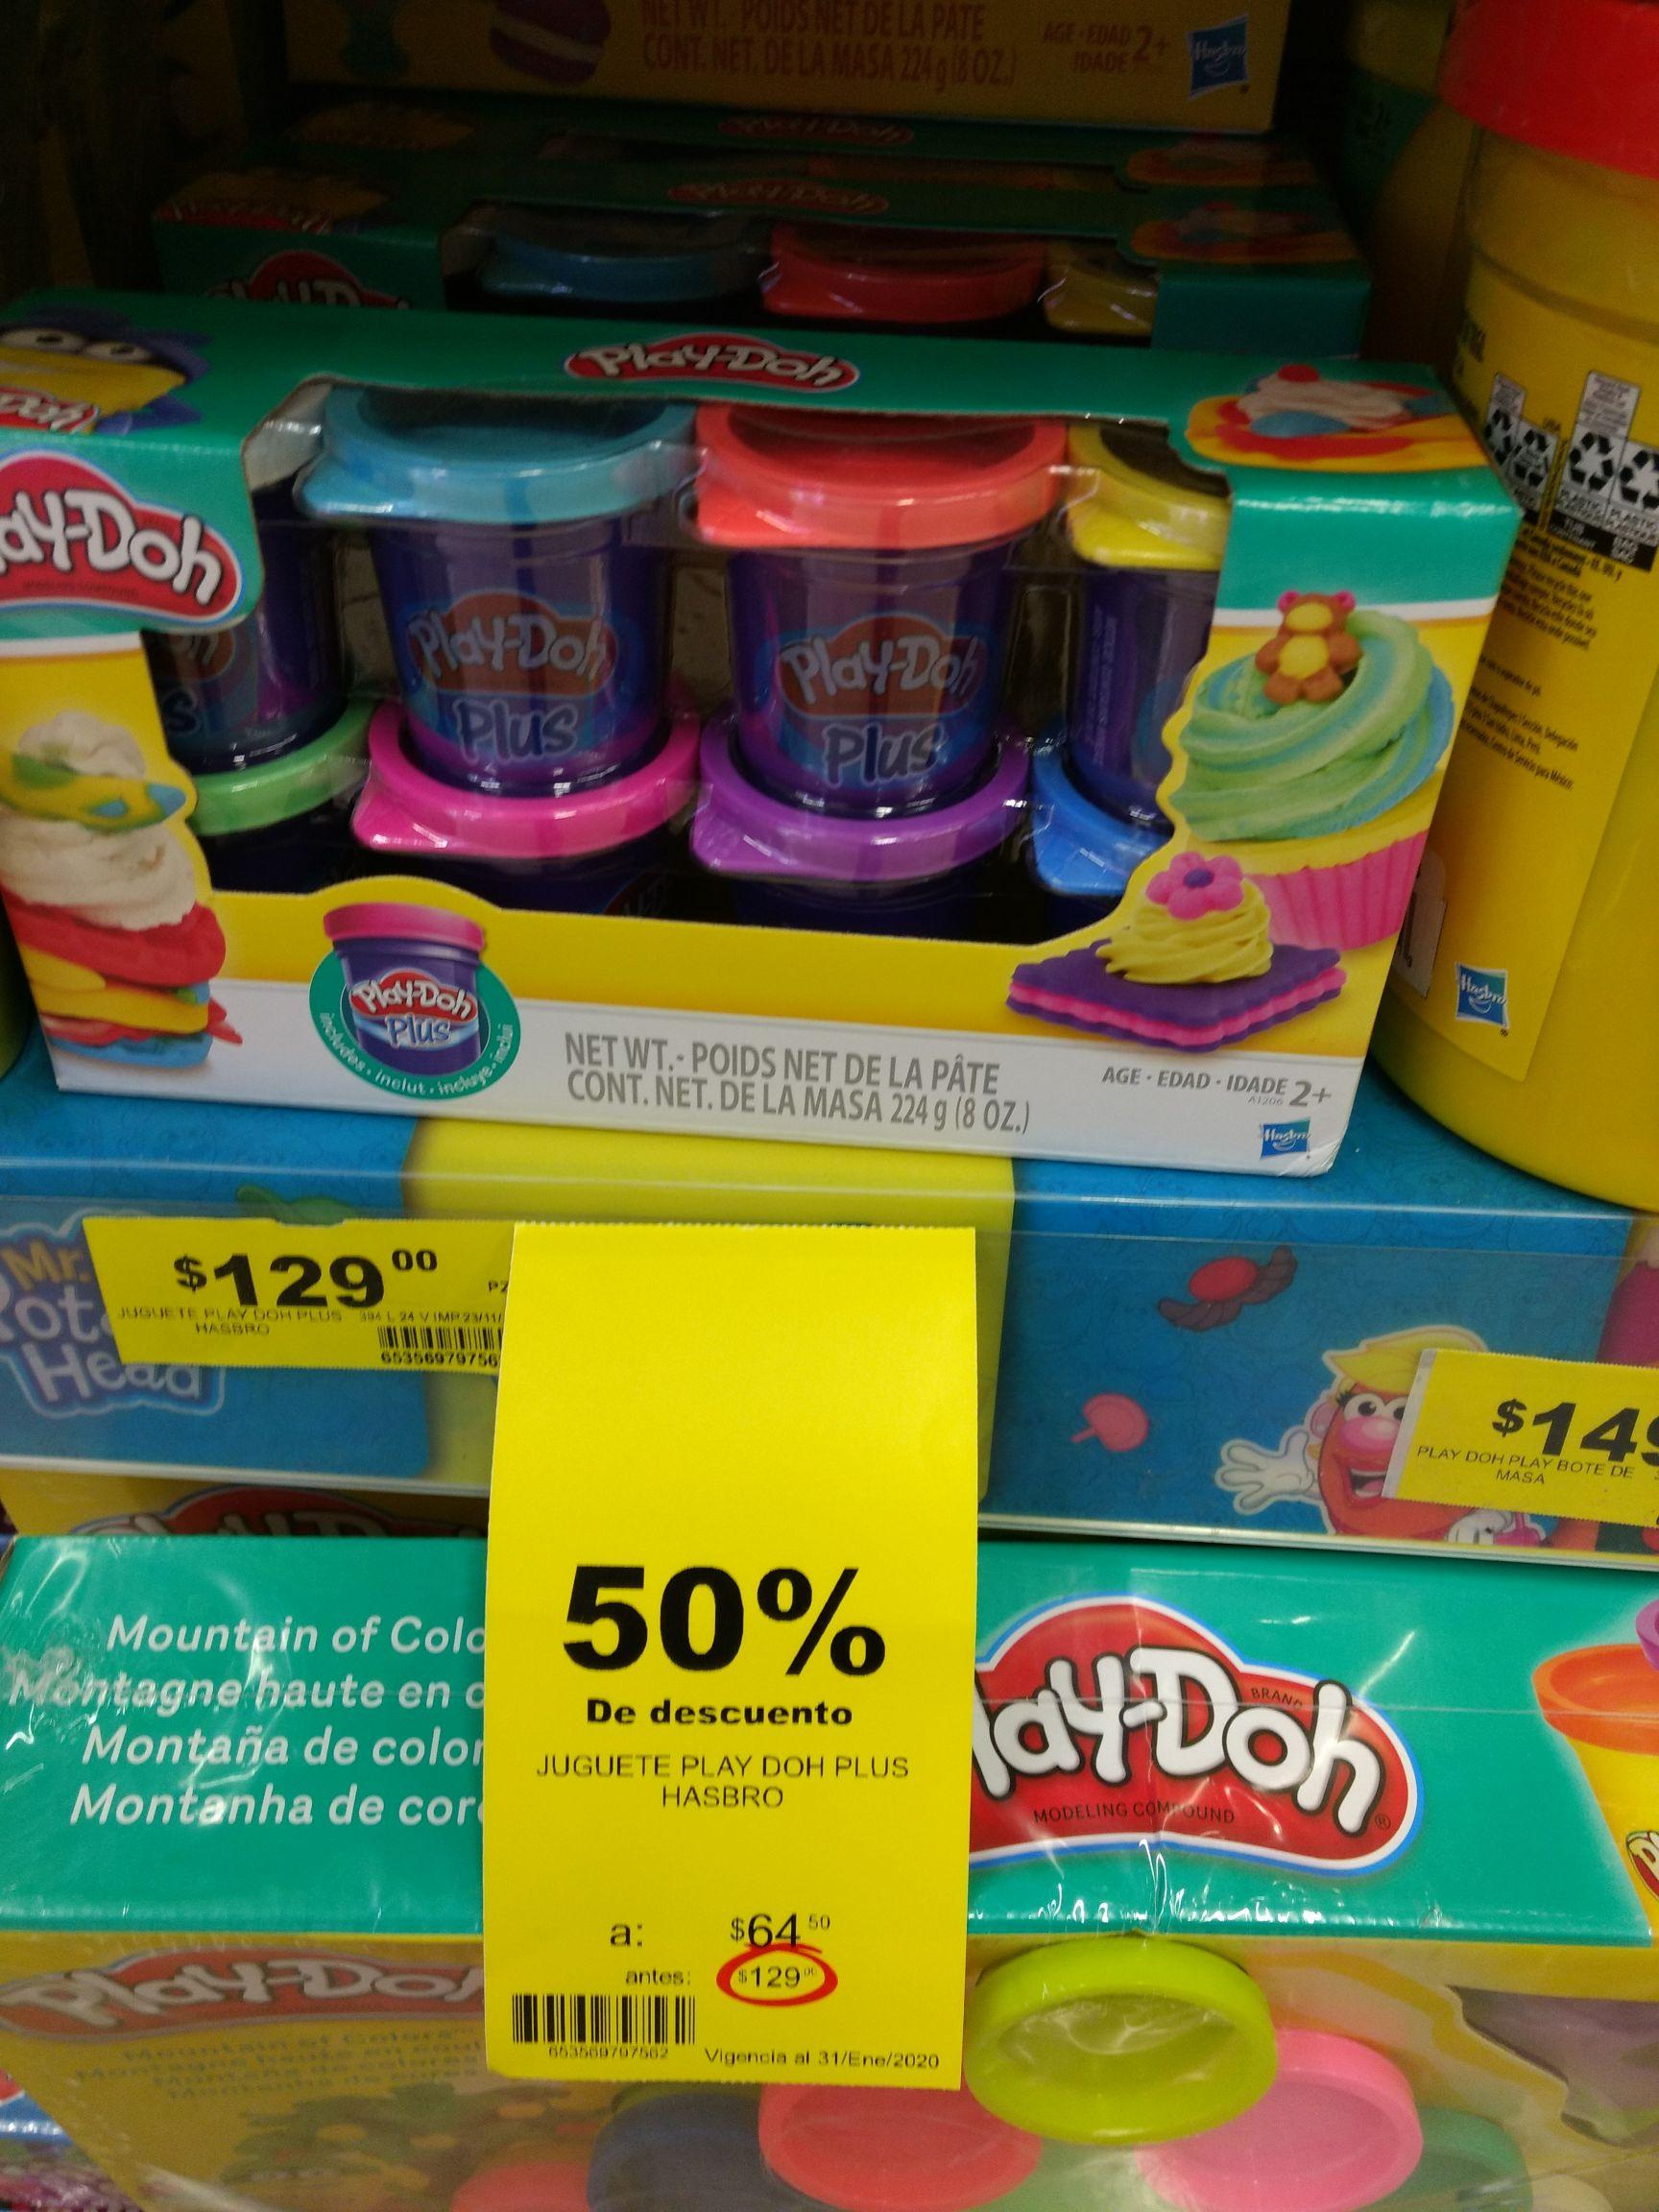 Soriana Mega: Play Doh Plus 50% de descuento